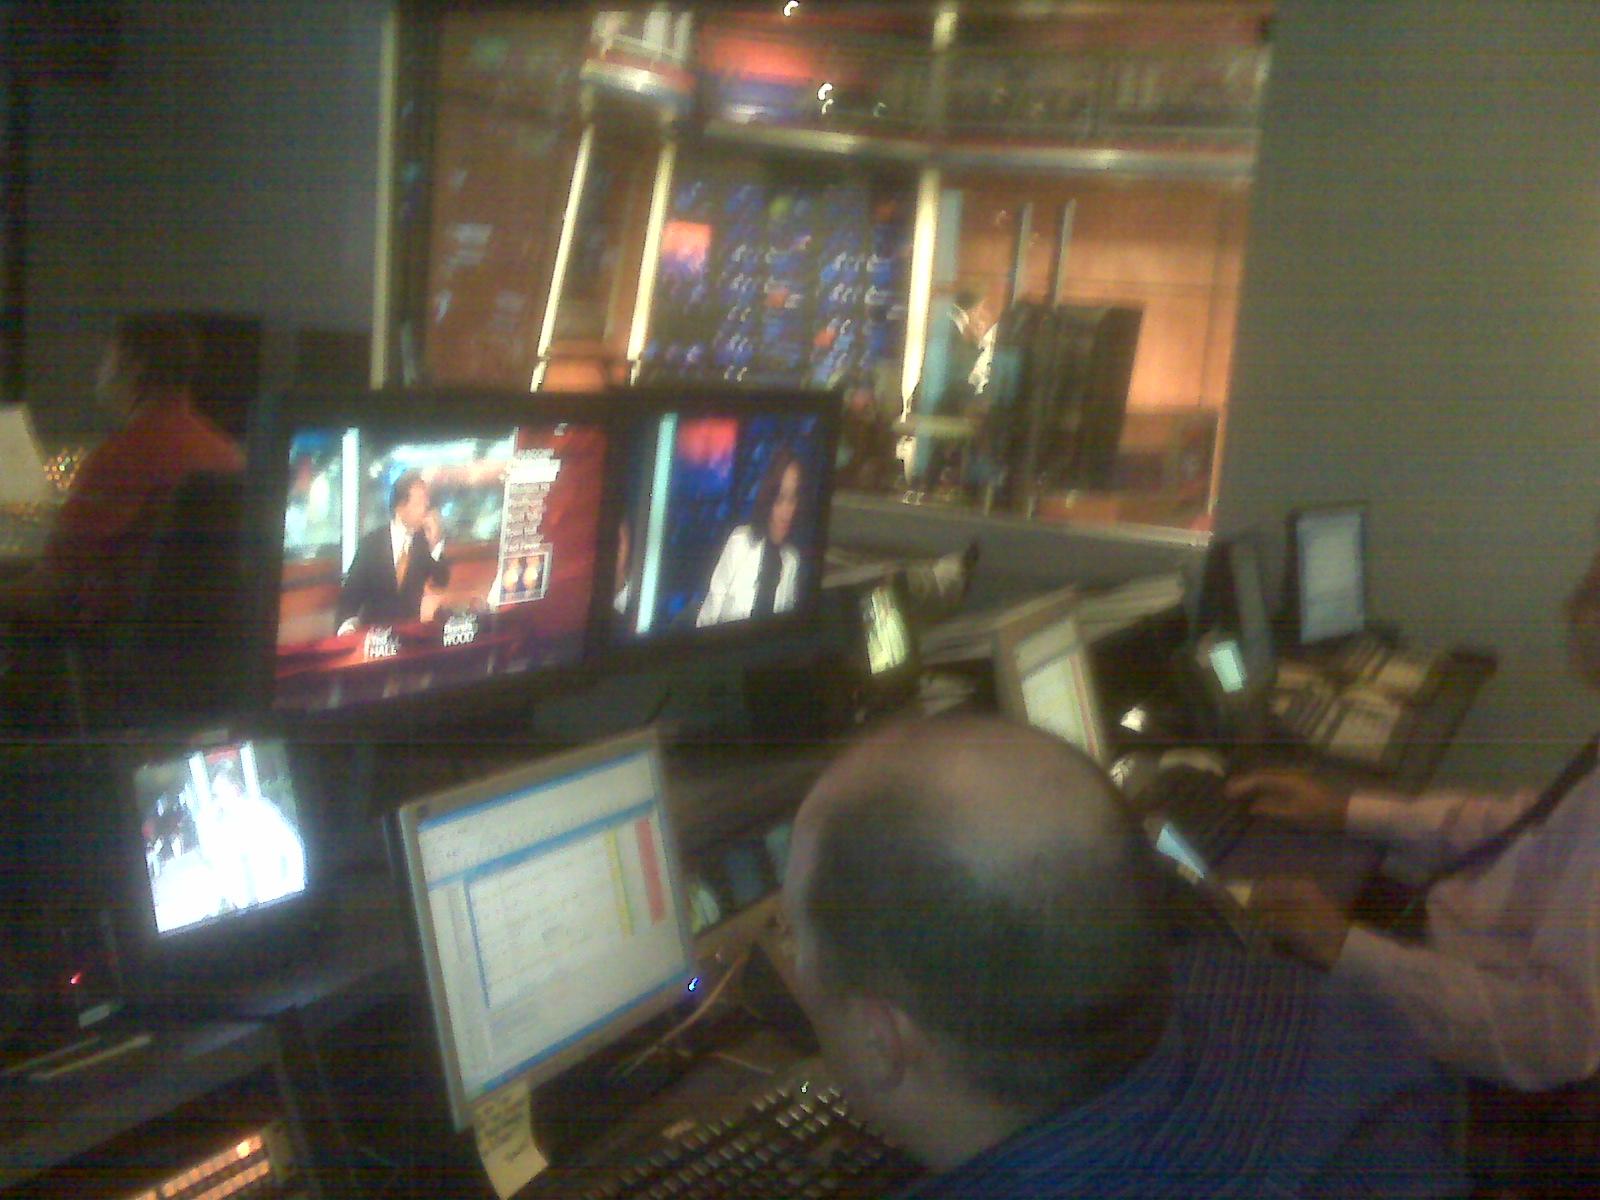 WXIA control room, 8.10.09, 5:58pm